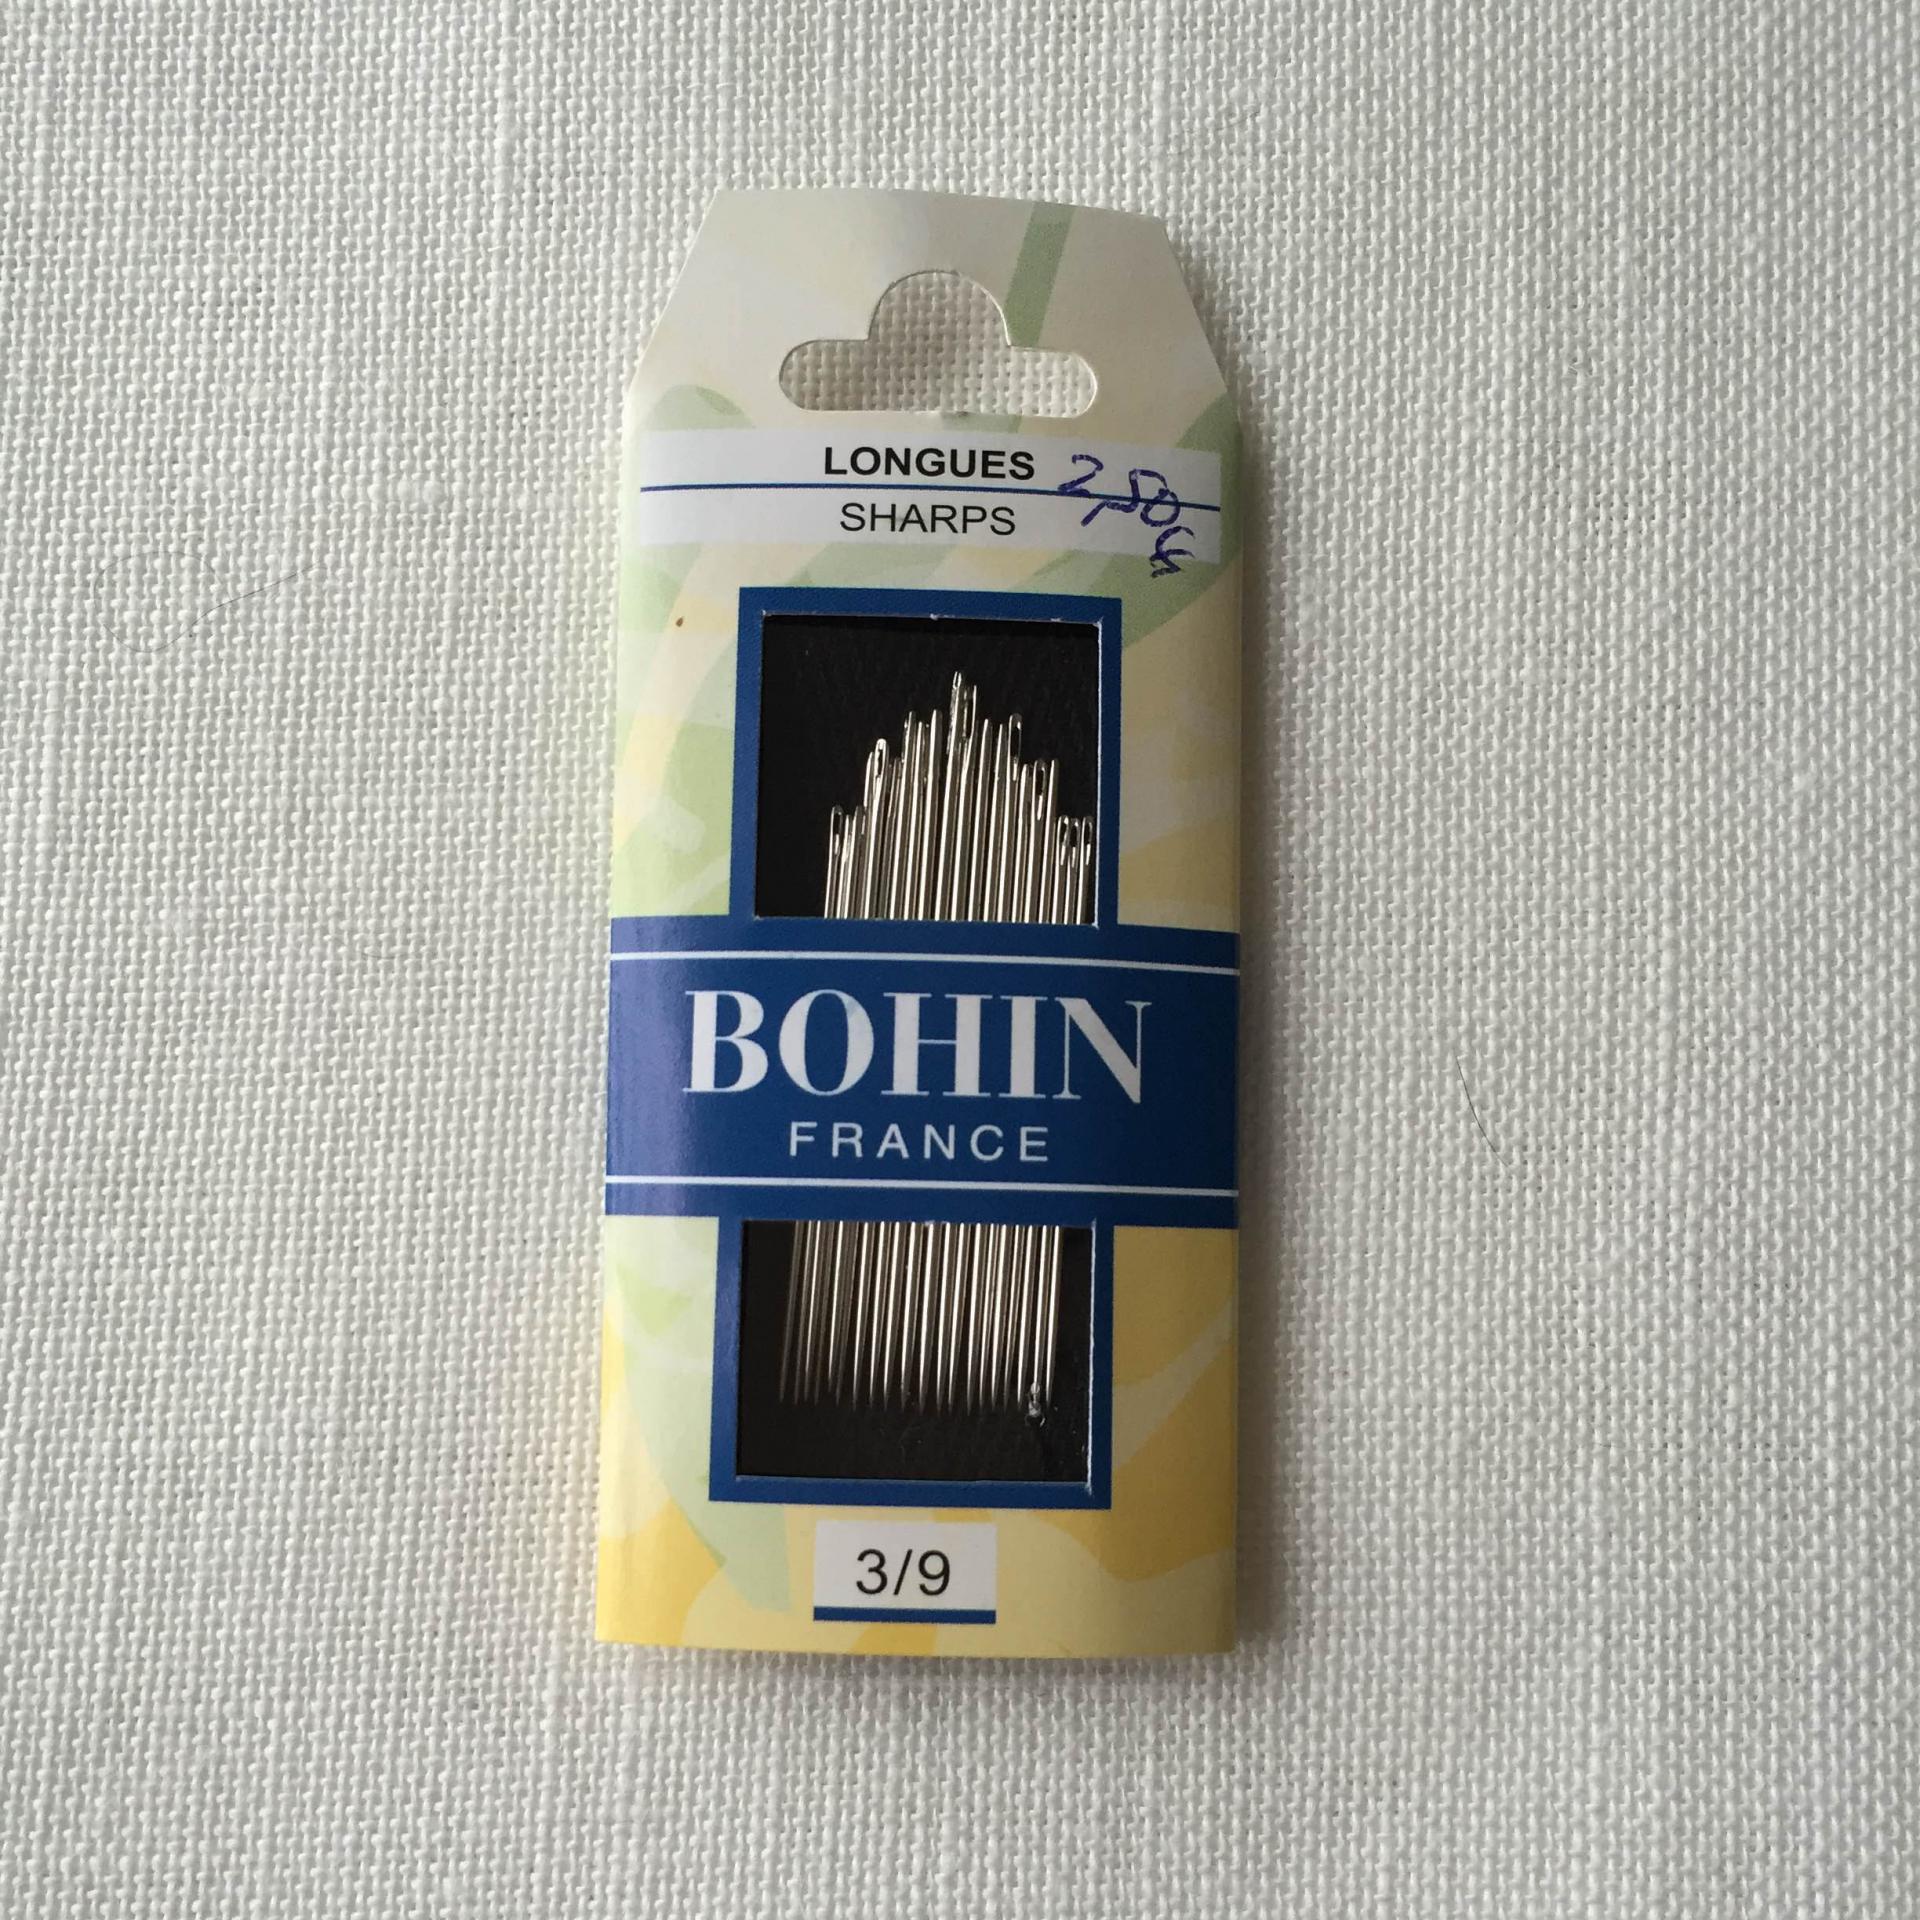 Bohin 3 9